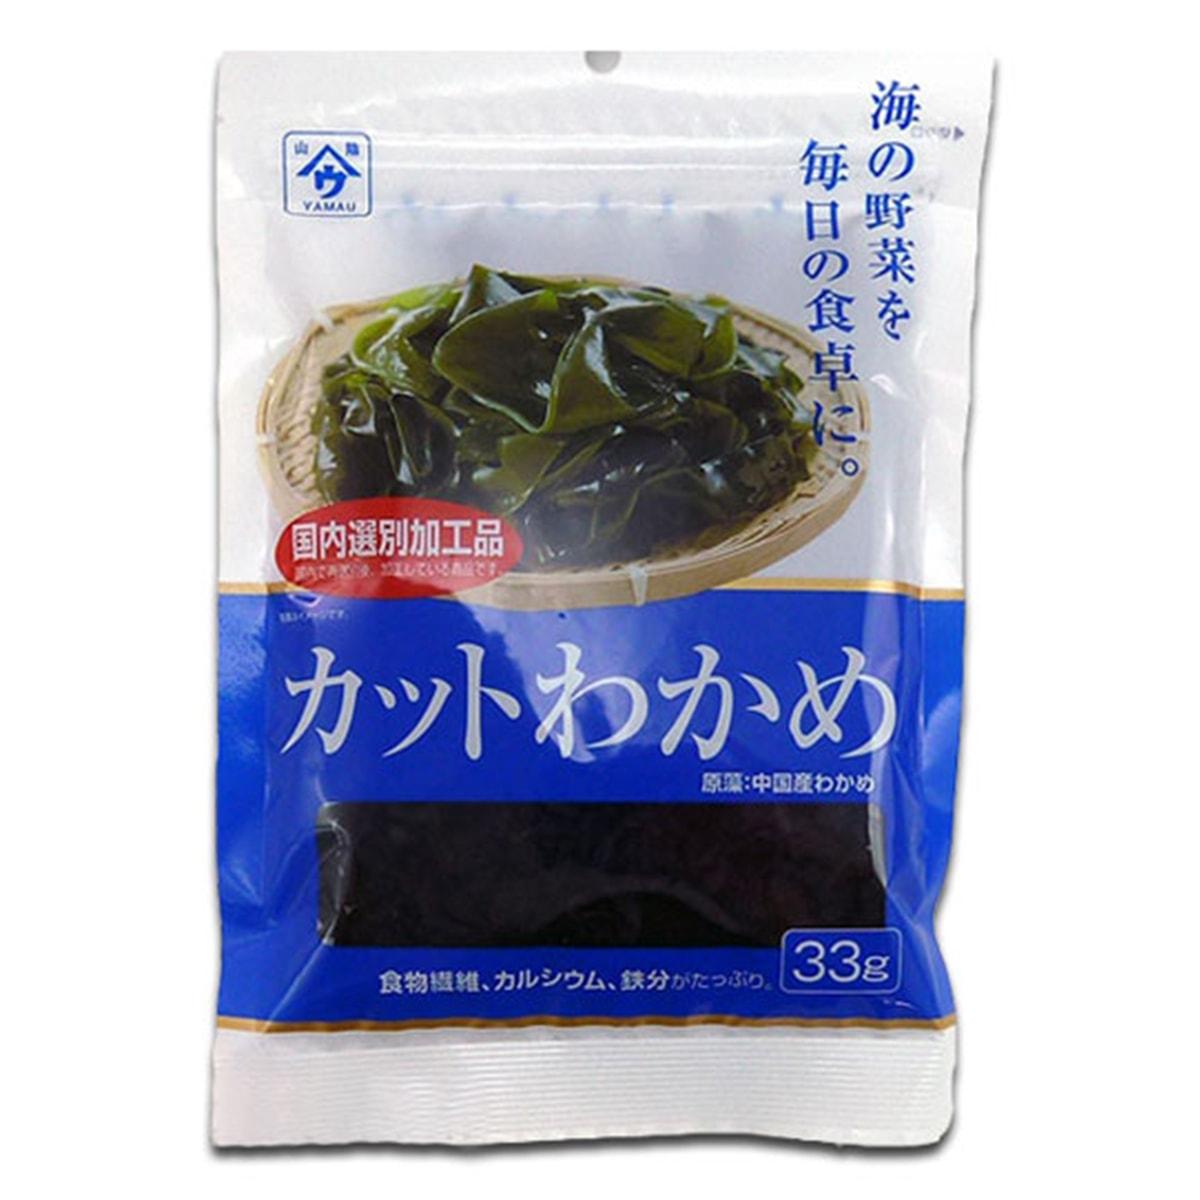 Buy Yamau Dried Wakame Seaweed - 24 gm